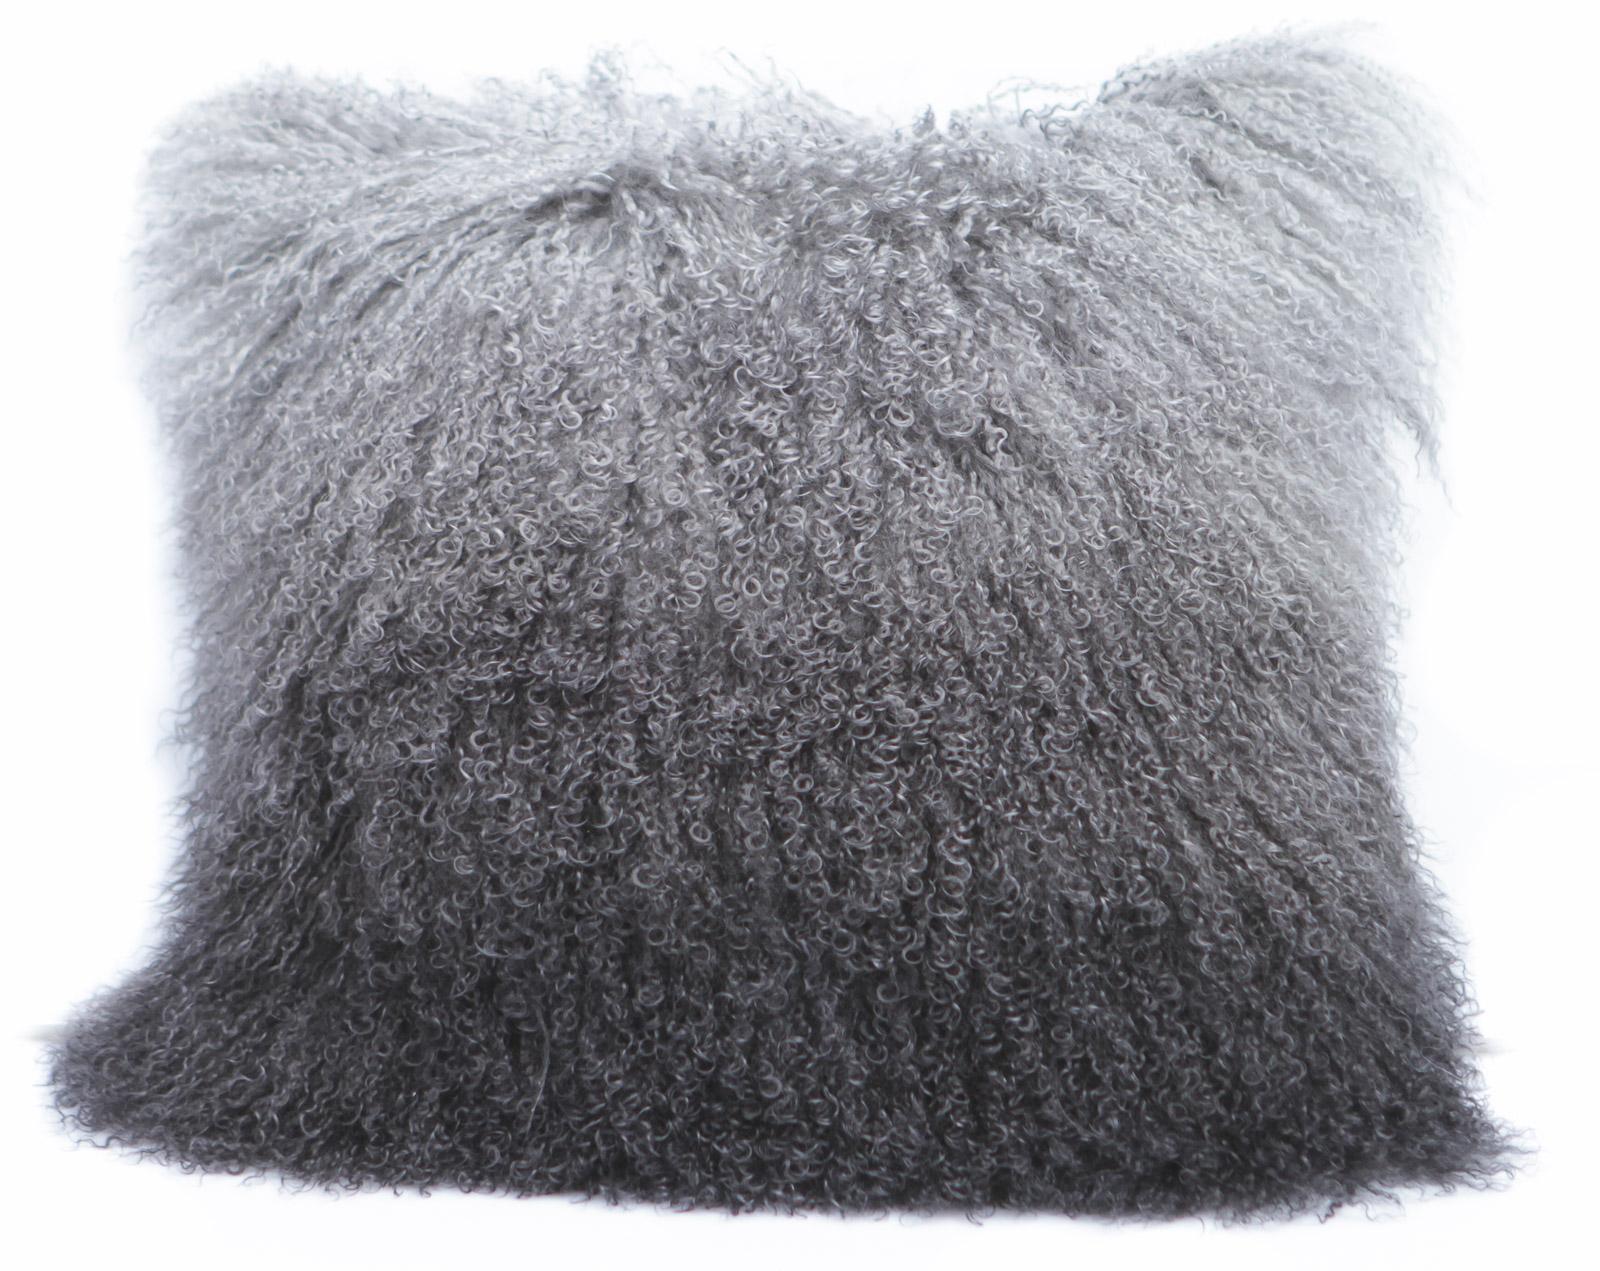 Tibet Lammfell Kissen Hülle Grey Gradient Grey Gradient 40 x 40 cm Grey Gradient | 40 x 40 cm